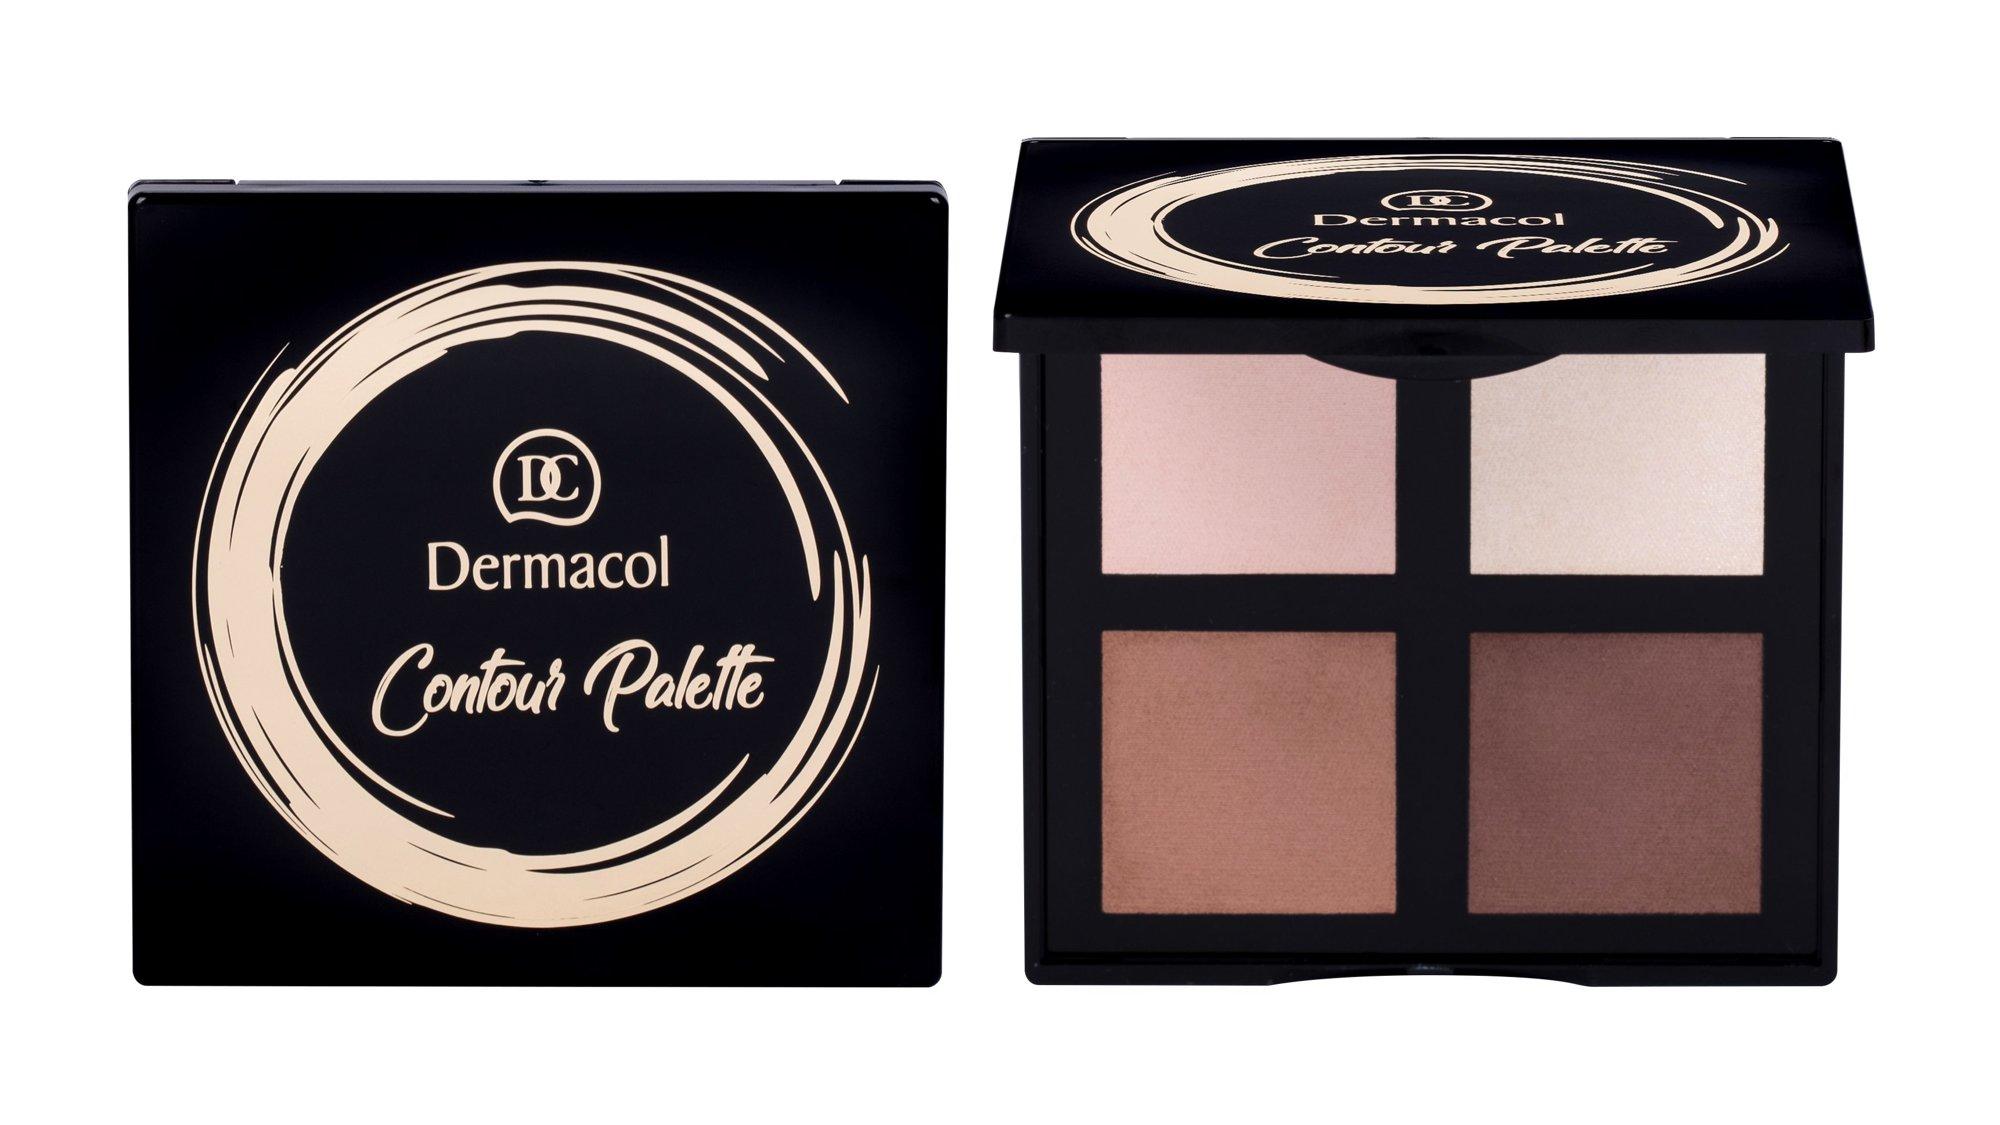 Dermacol Contour Palette Powder 12ml 1